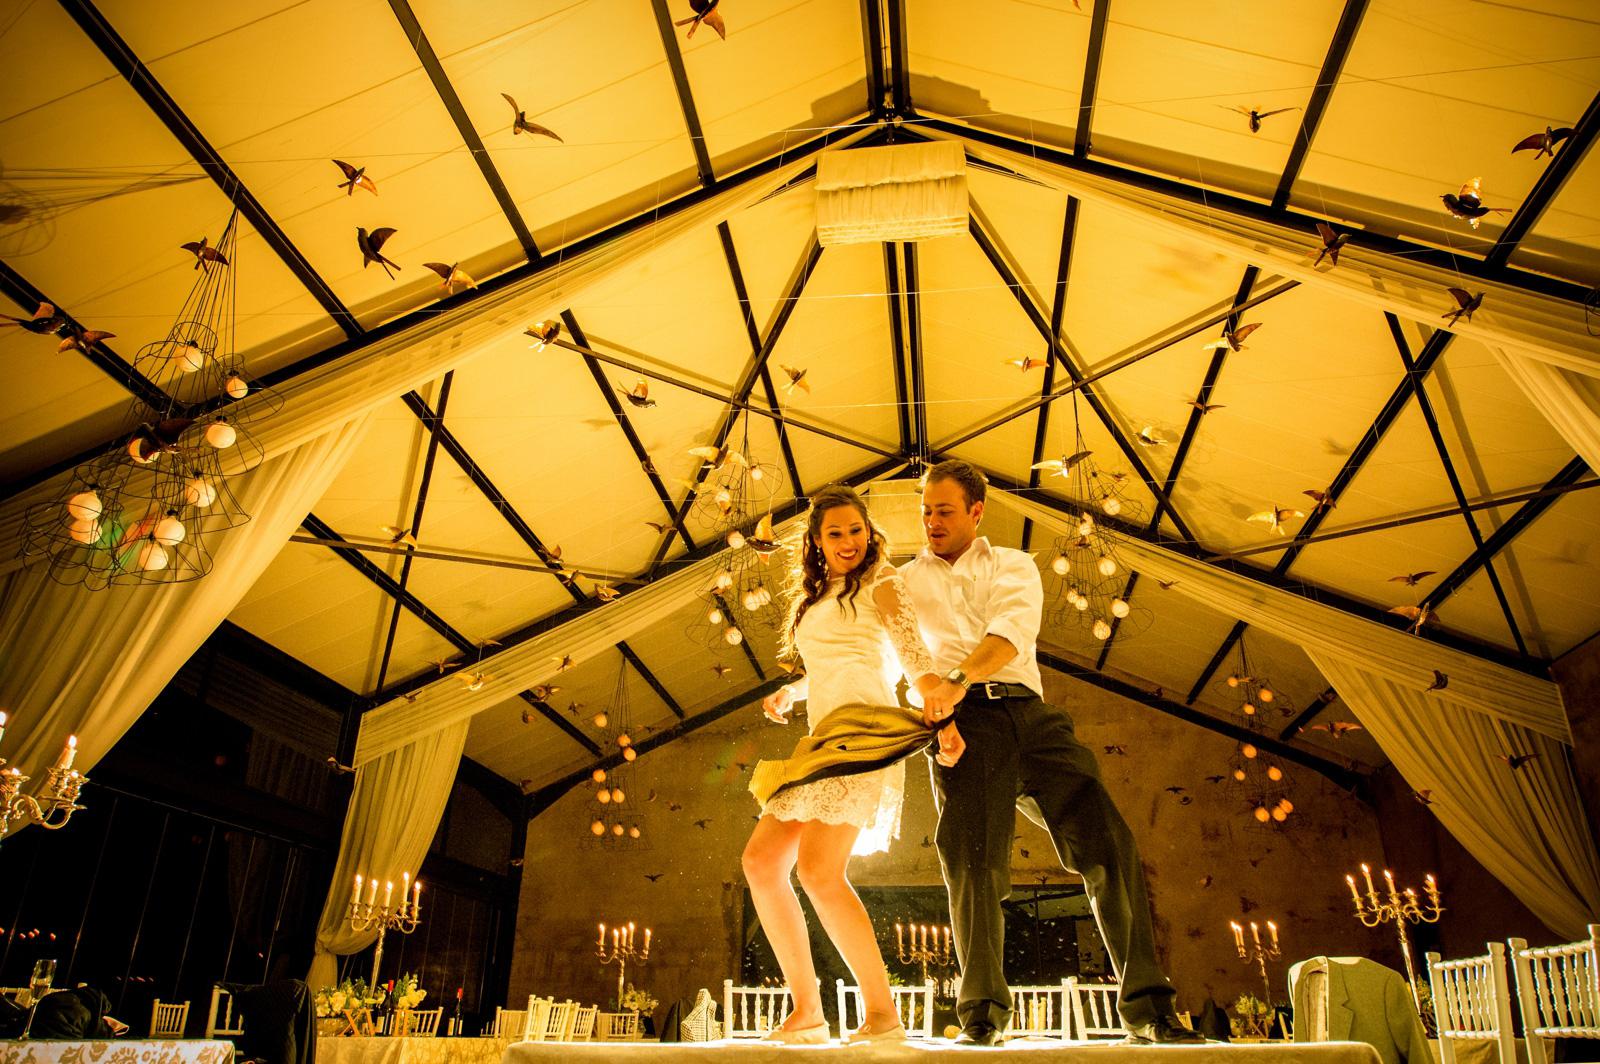 Dancing-Jacki-Bruniquel-Hoorah013